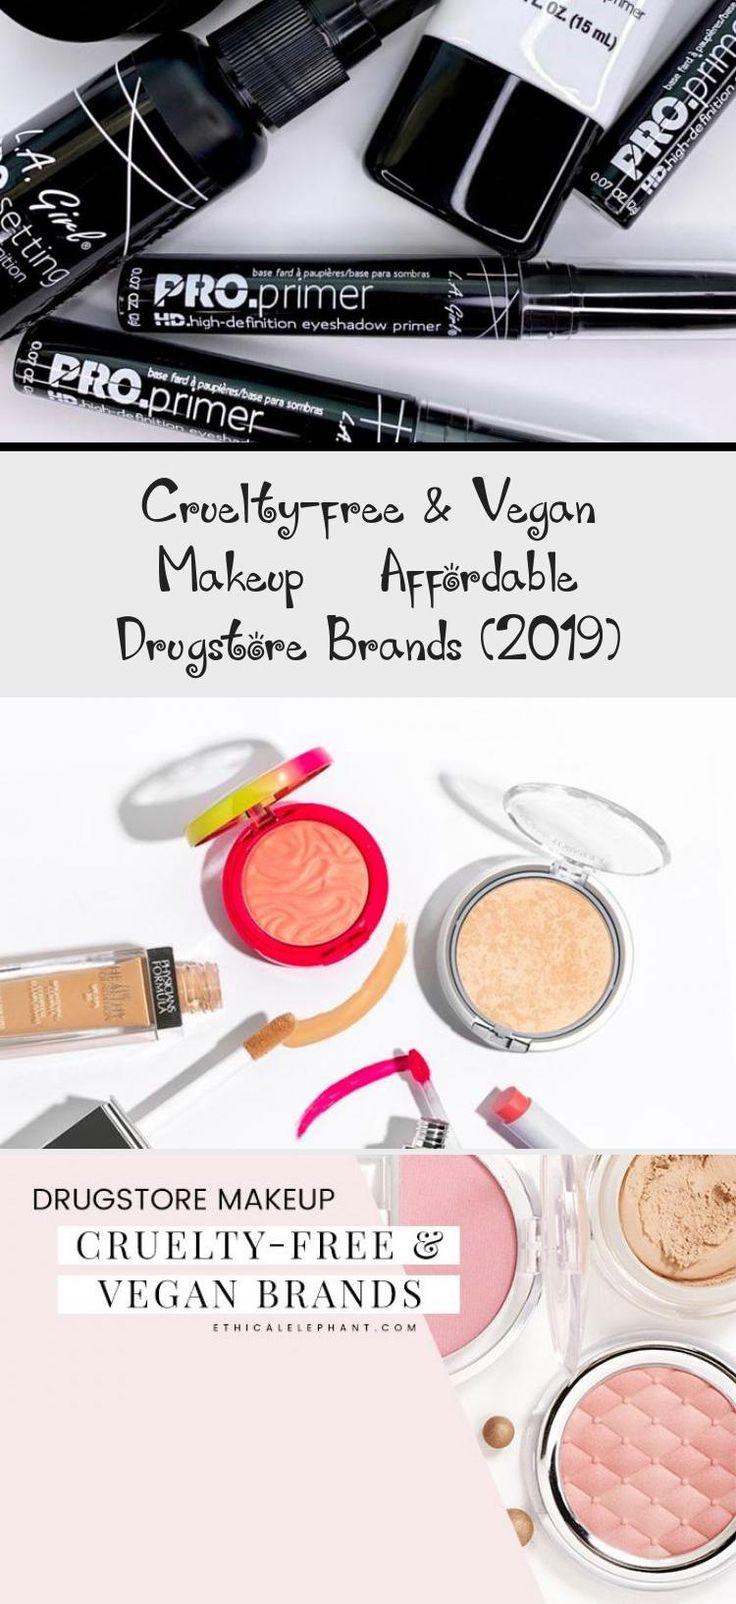 En Blog En Blog in 2020 Drugstore makeup brands, Vegan